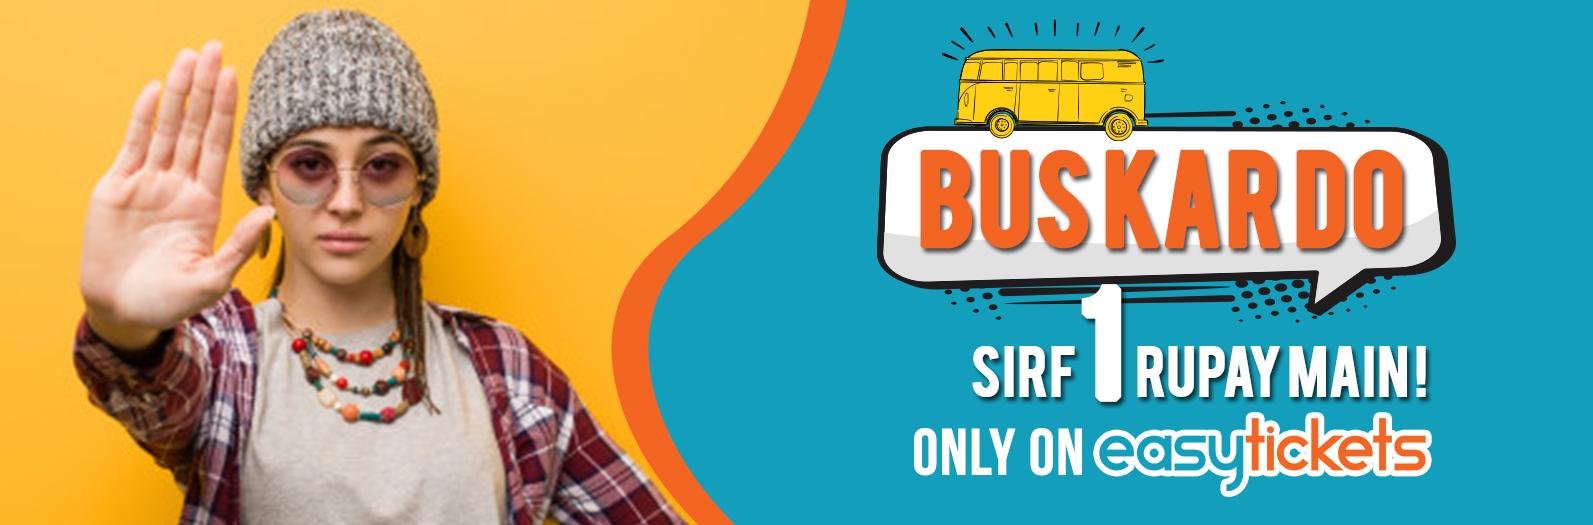 1 Rupee Bus Ticket